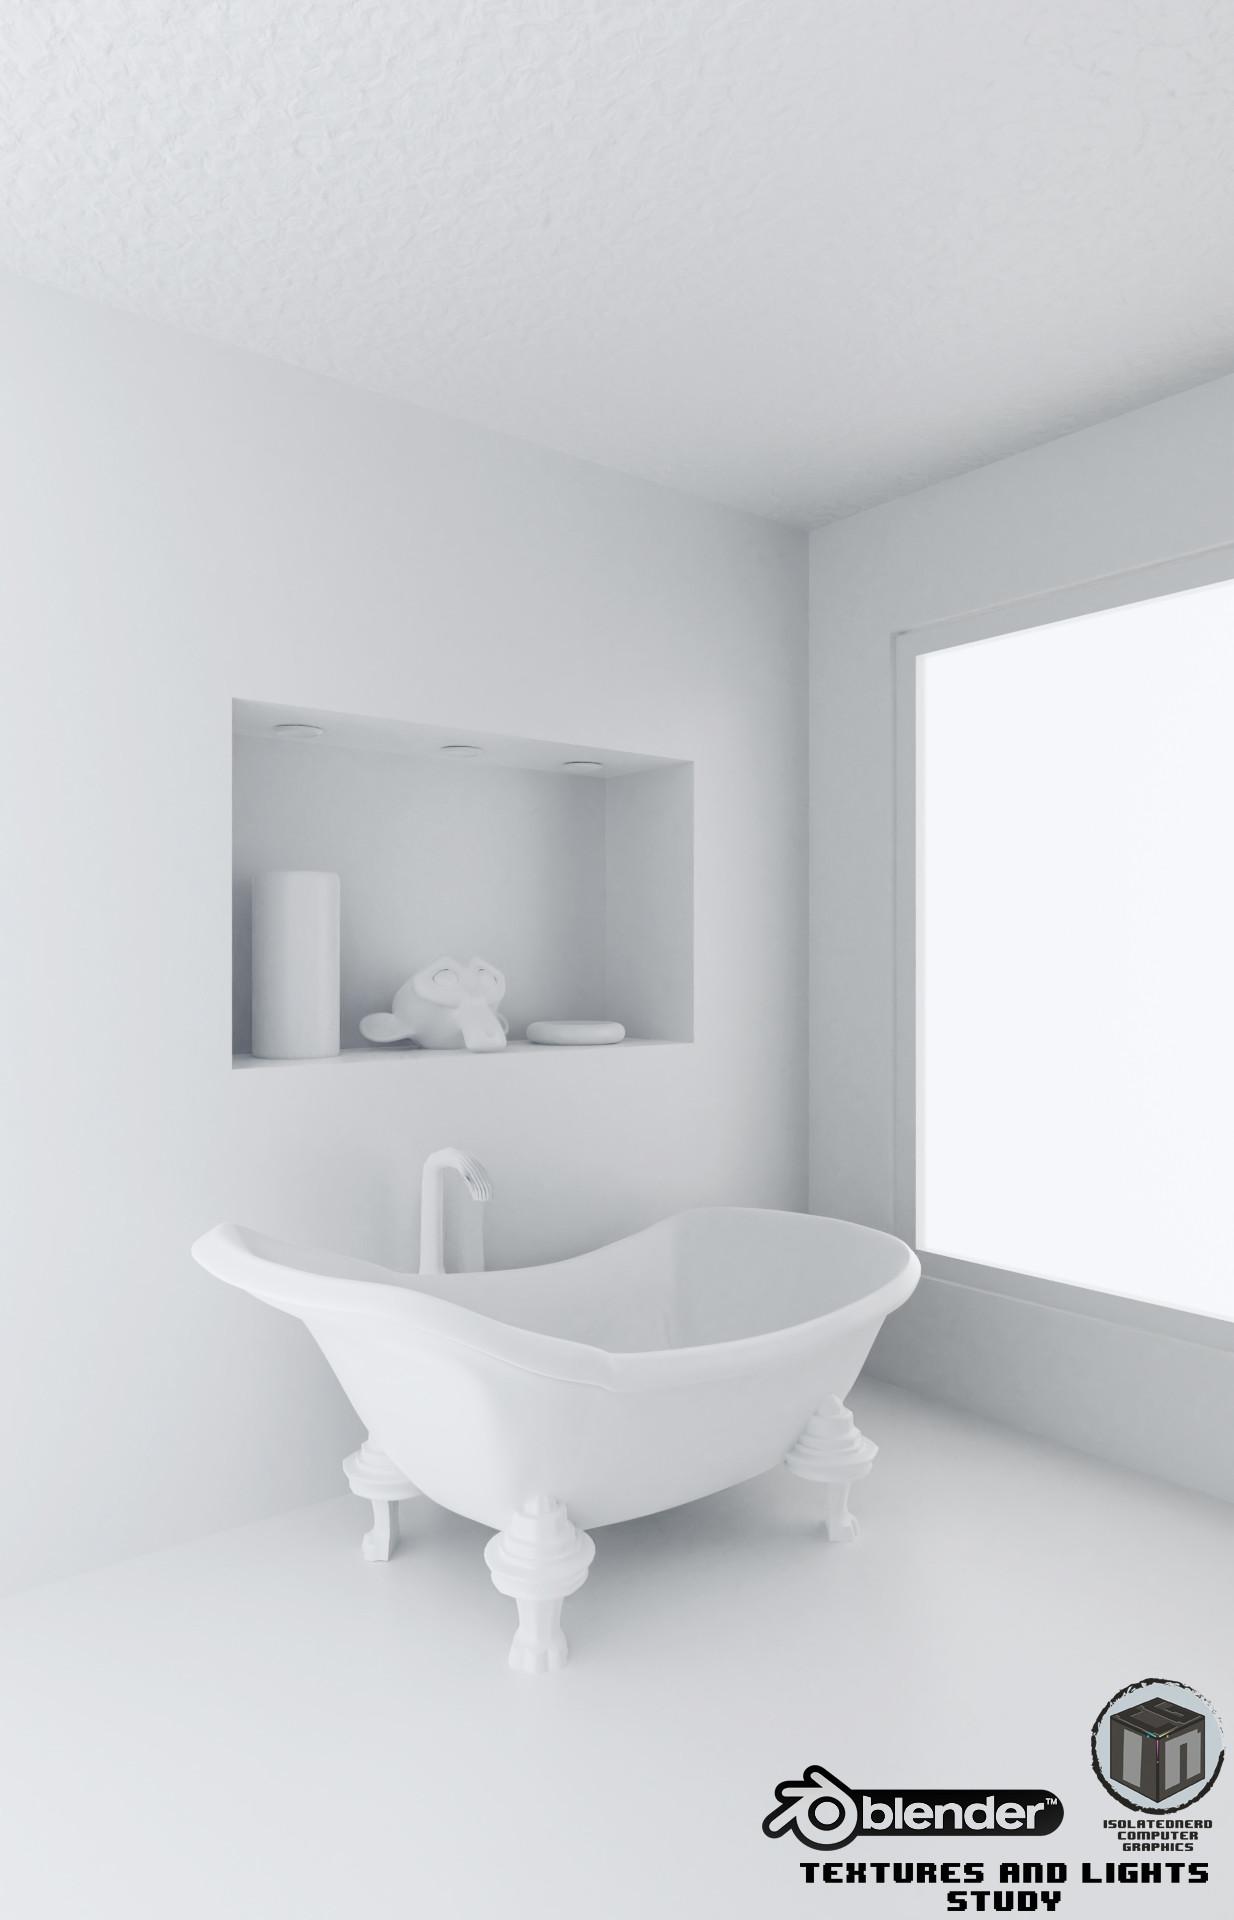 Matias toloza isolatednerdcg bathblank